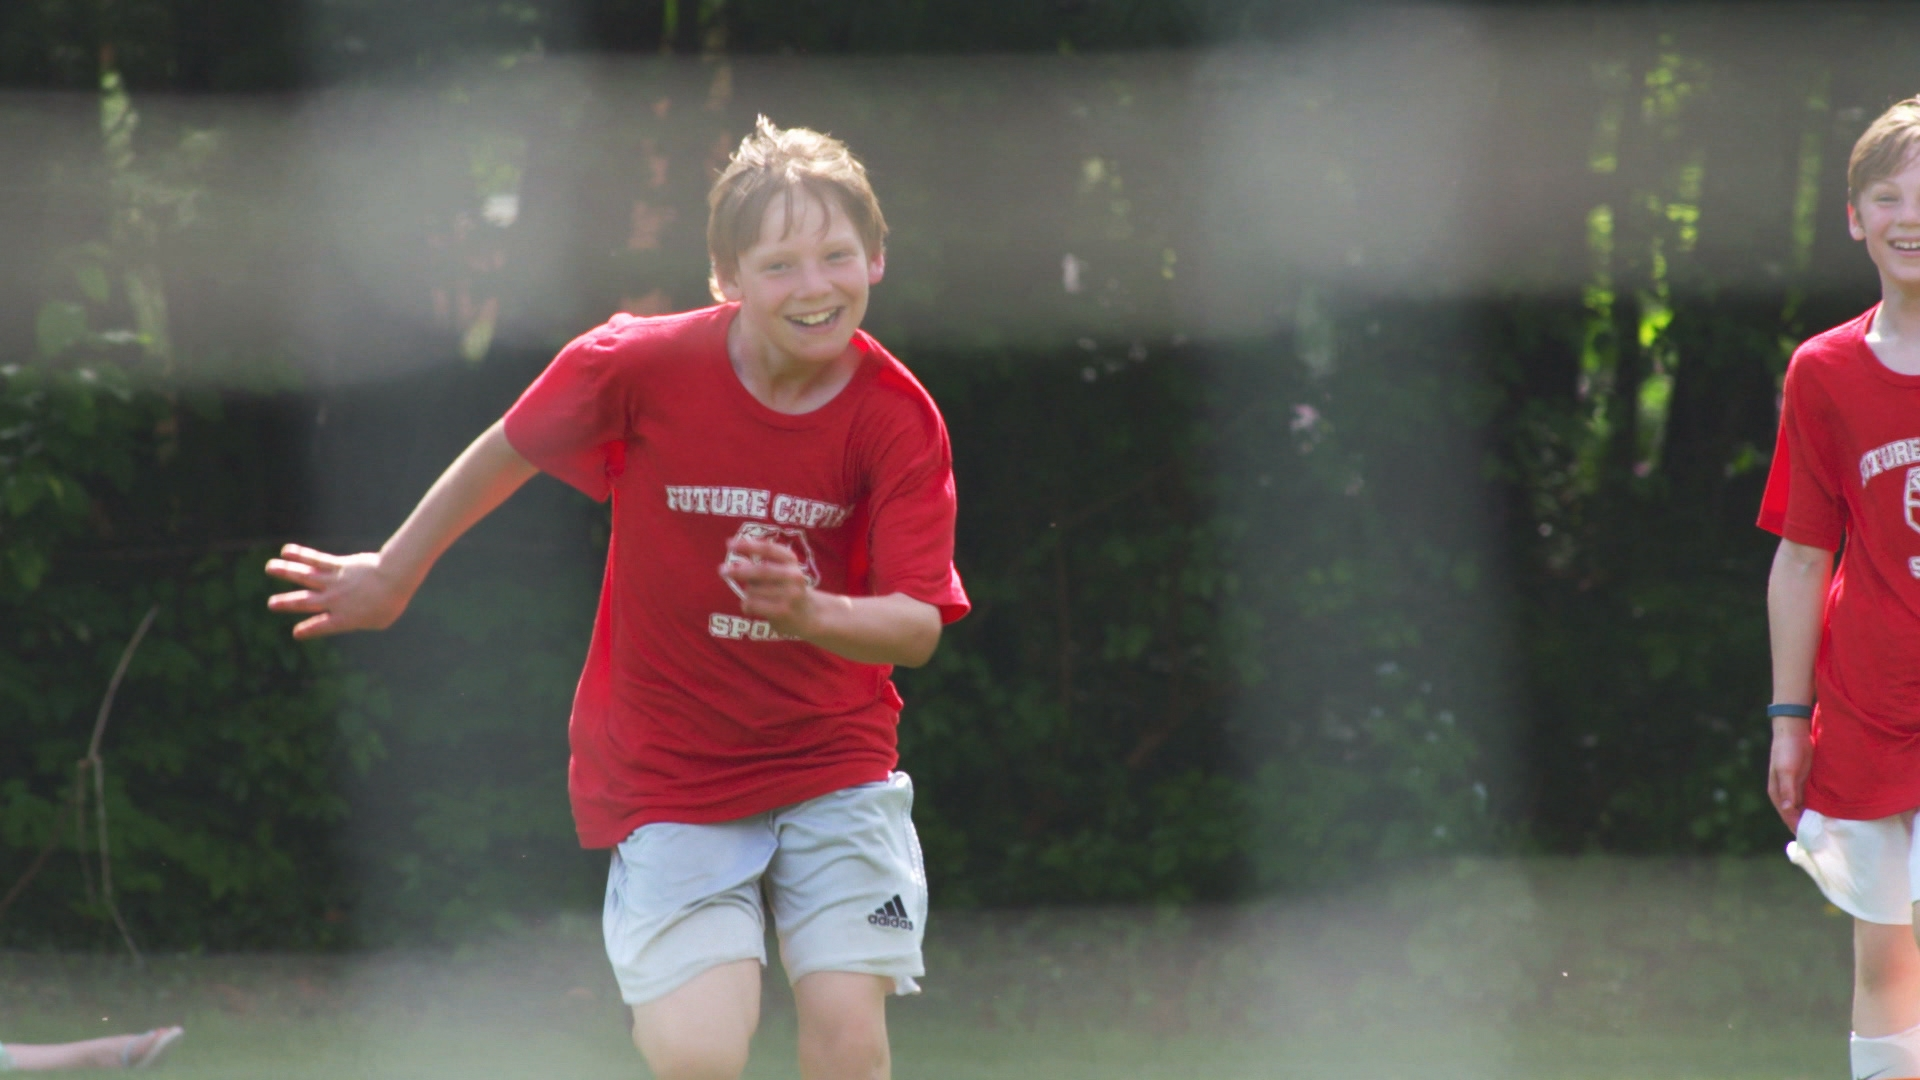 Gavin running and smiling .jpg